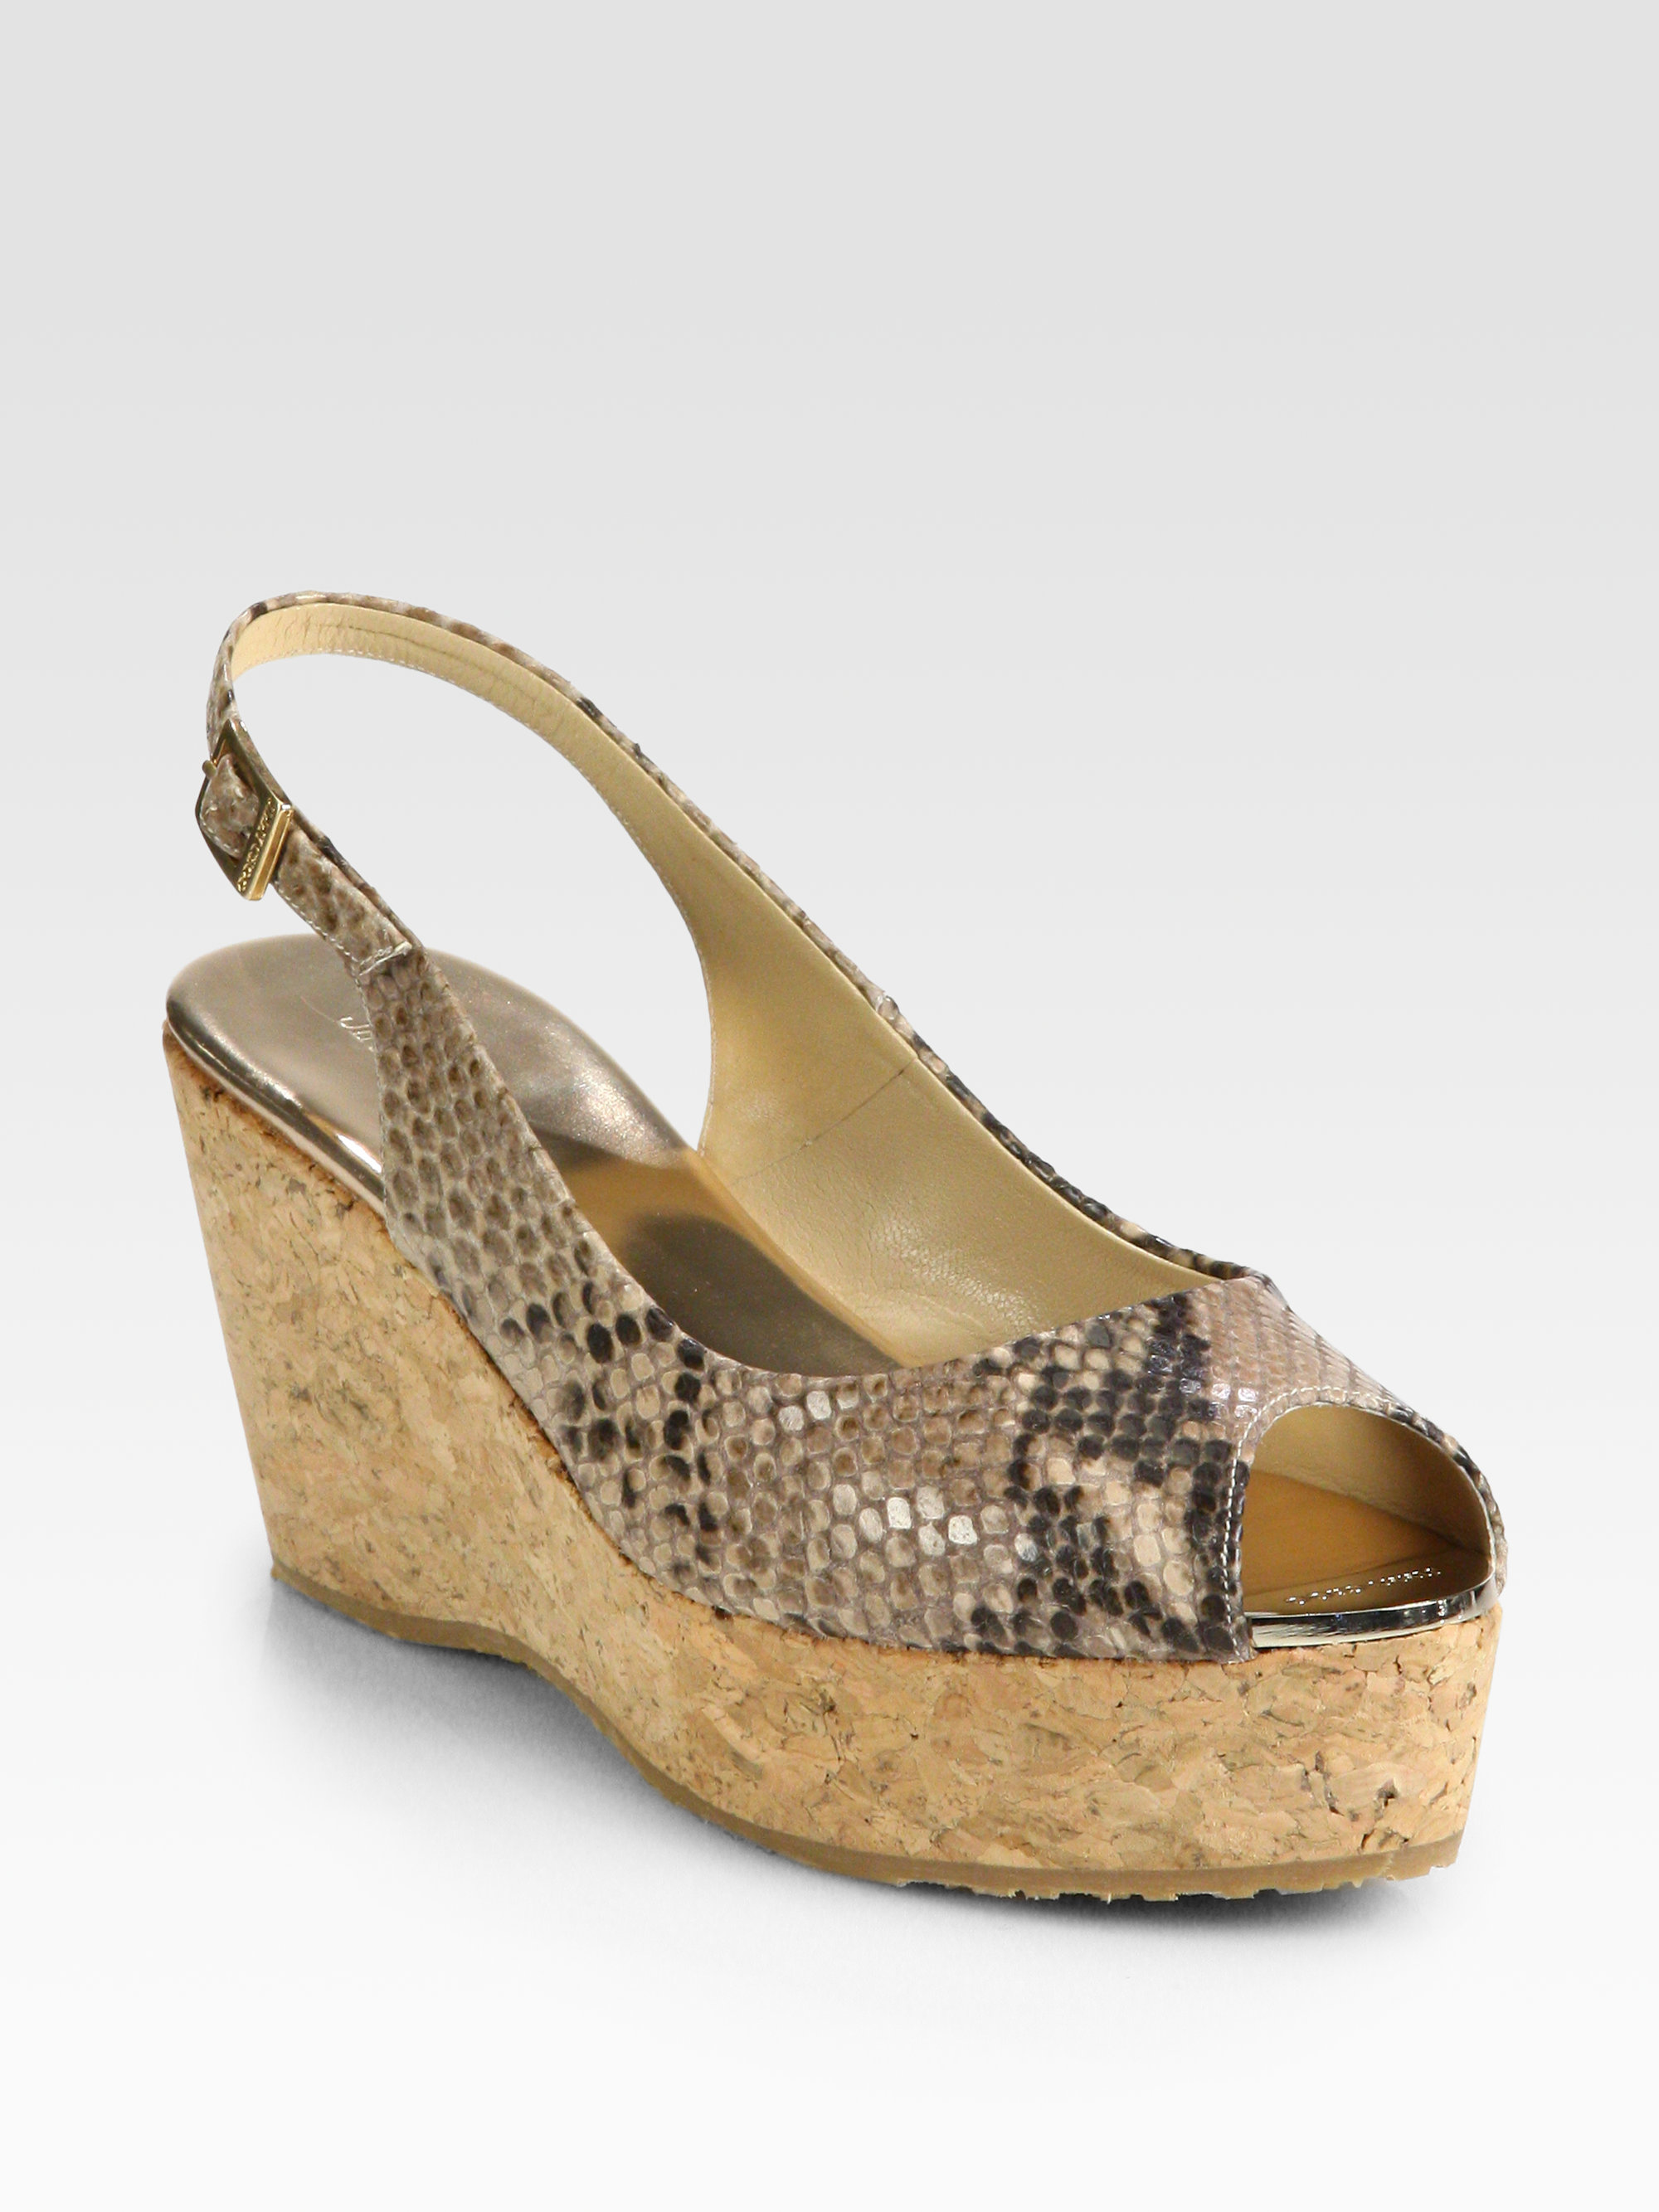 Jimmy Choo Praise Snakeprint Leather Cork Wedge Sandals In